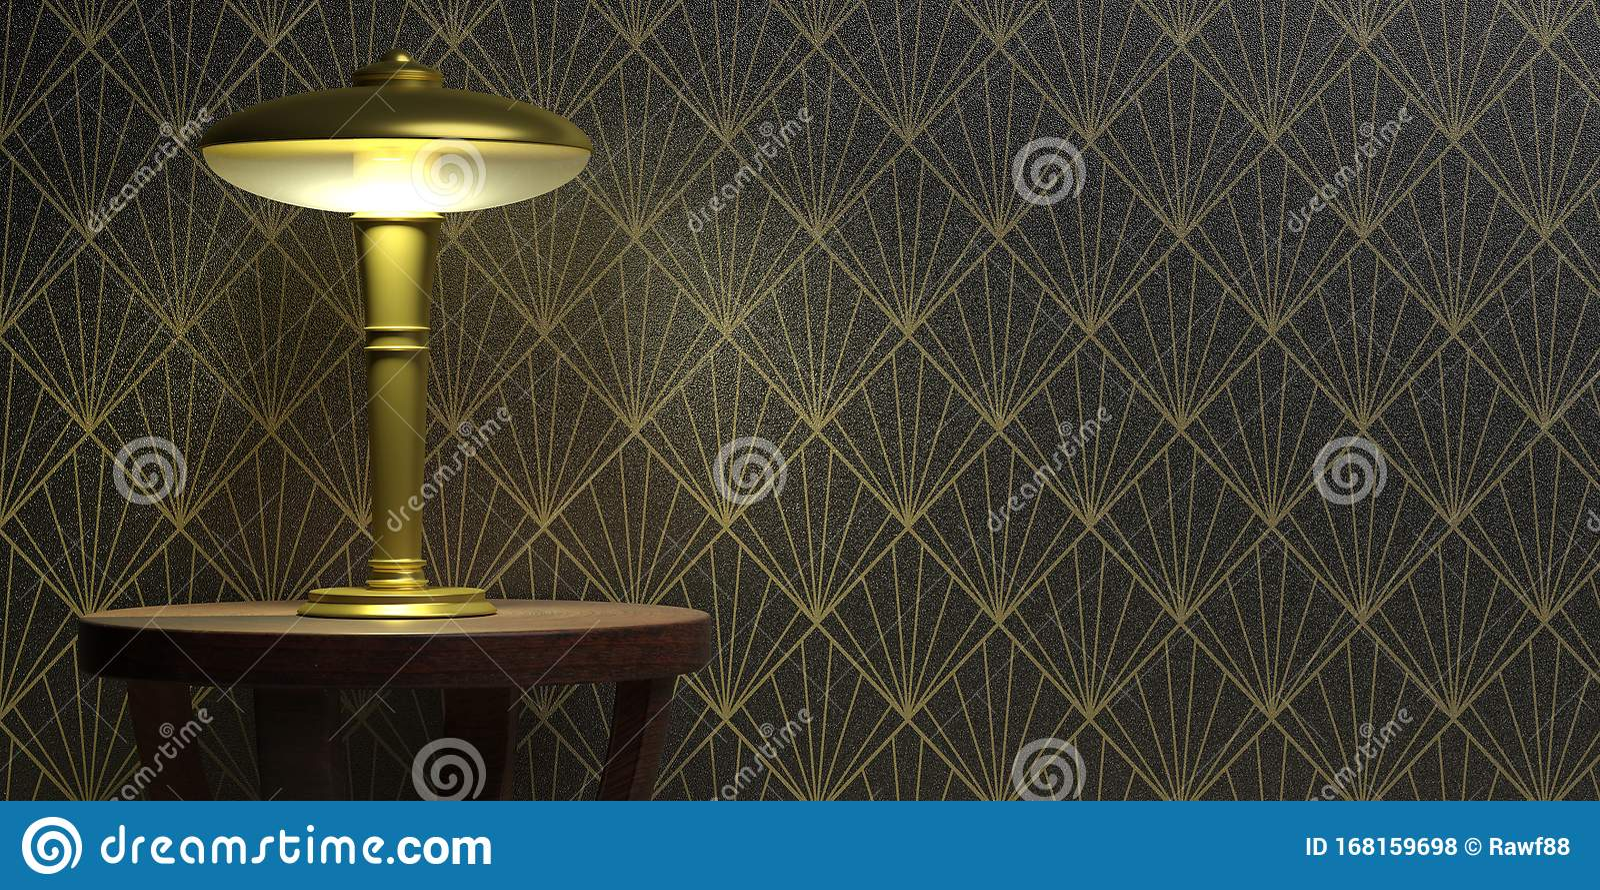 Table Lamp On Wallpaper Black Color Background Art Deco Style Decoration 3d Illustration Stock Illustration Illustration Of Fashioned Illuminated 168159698